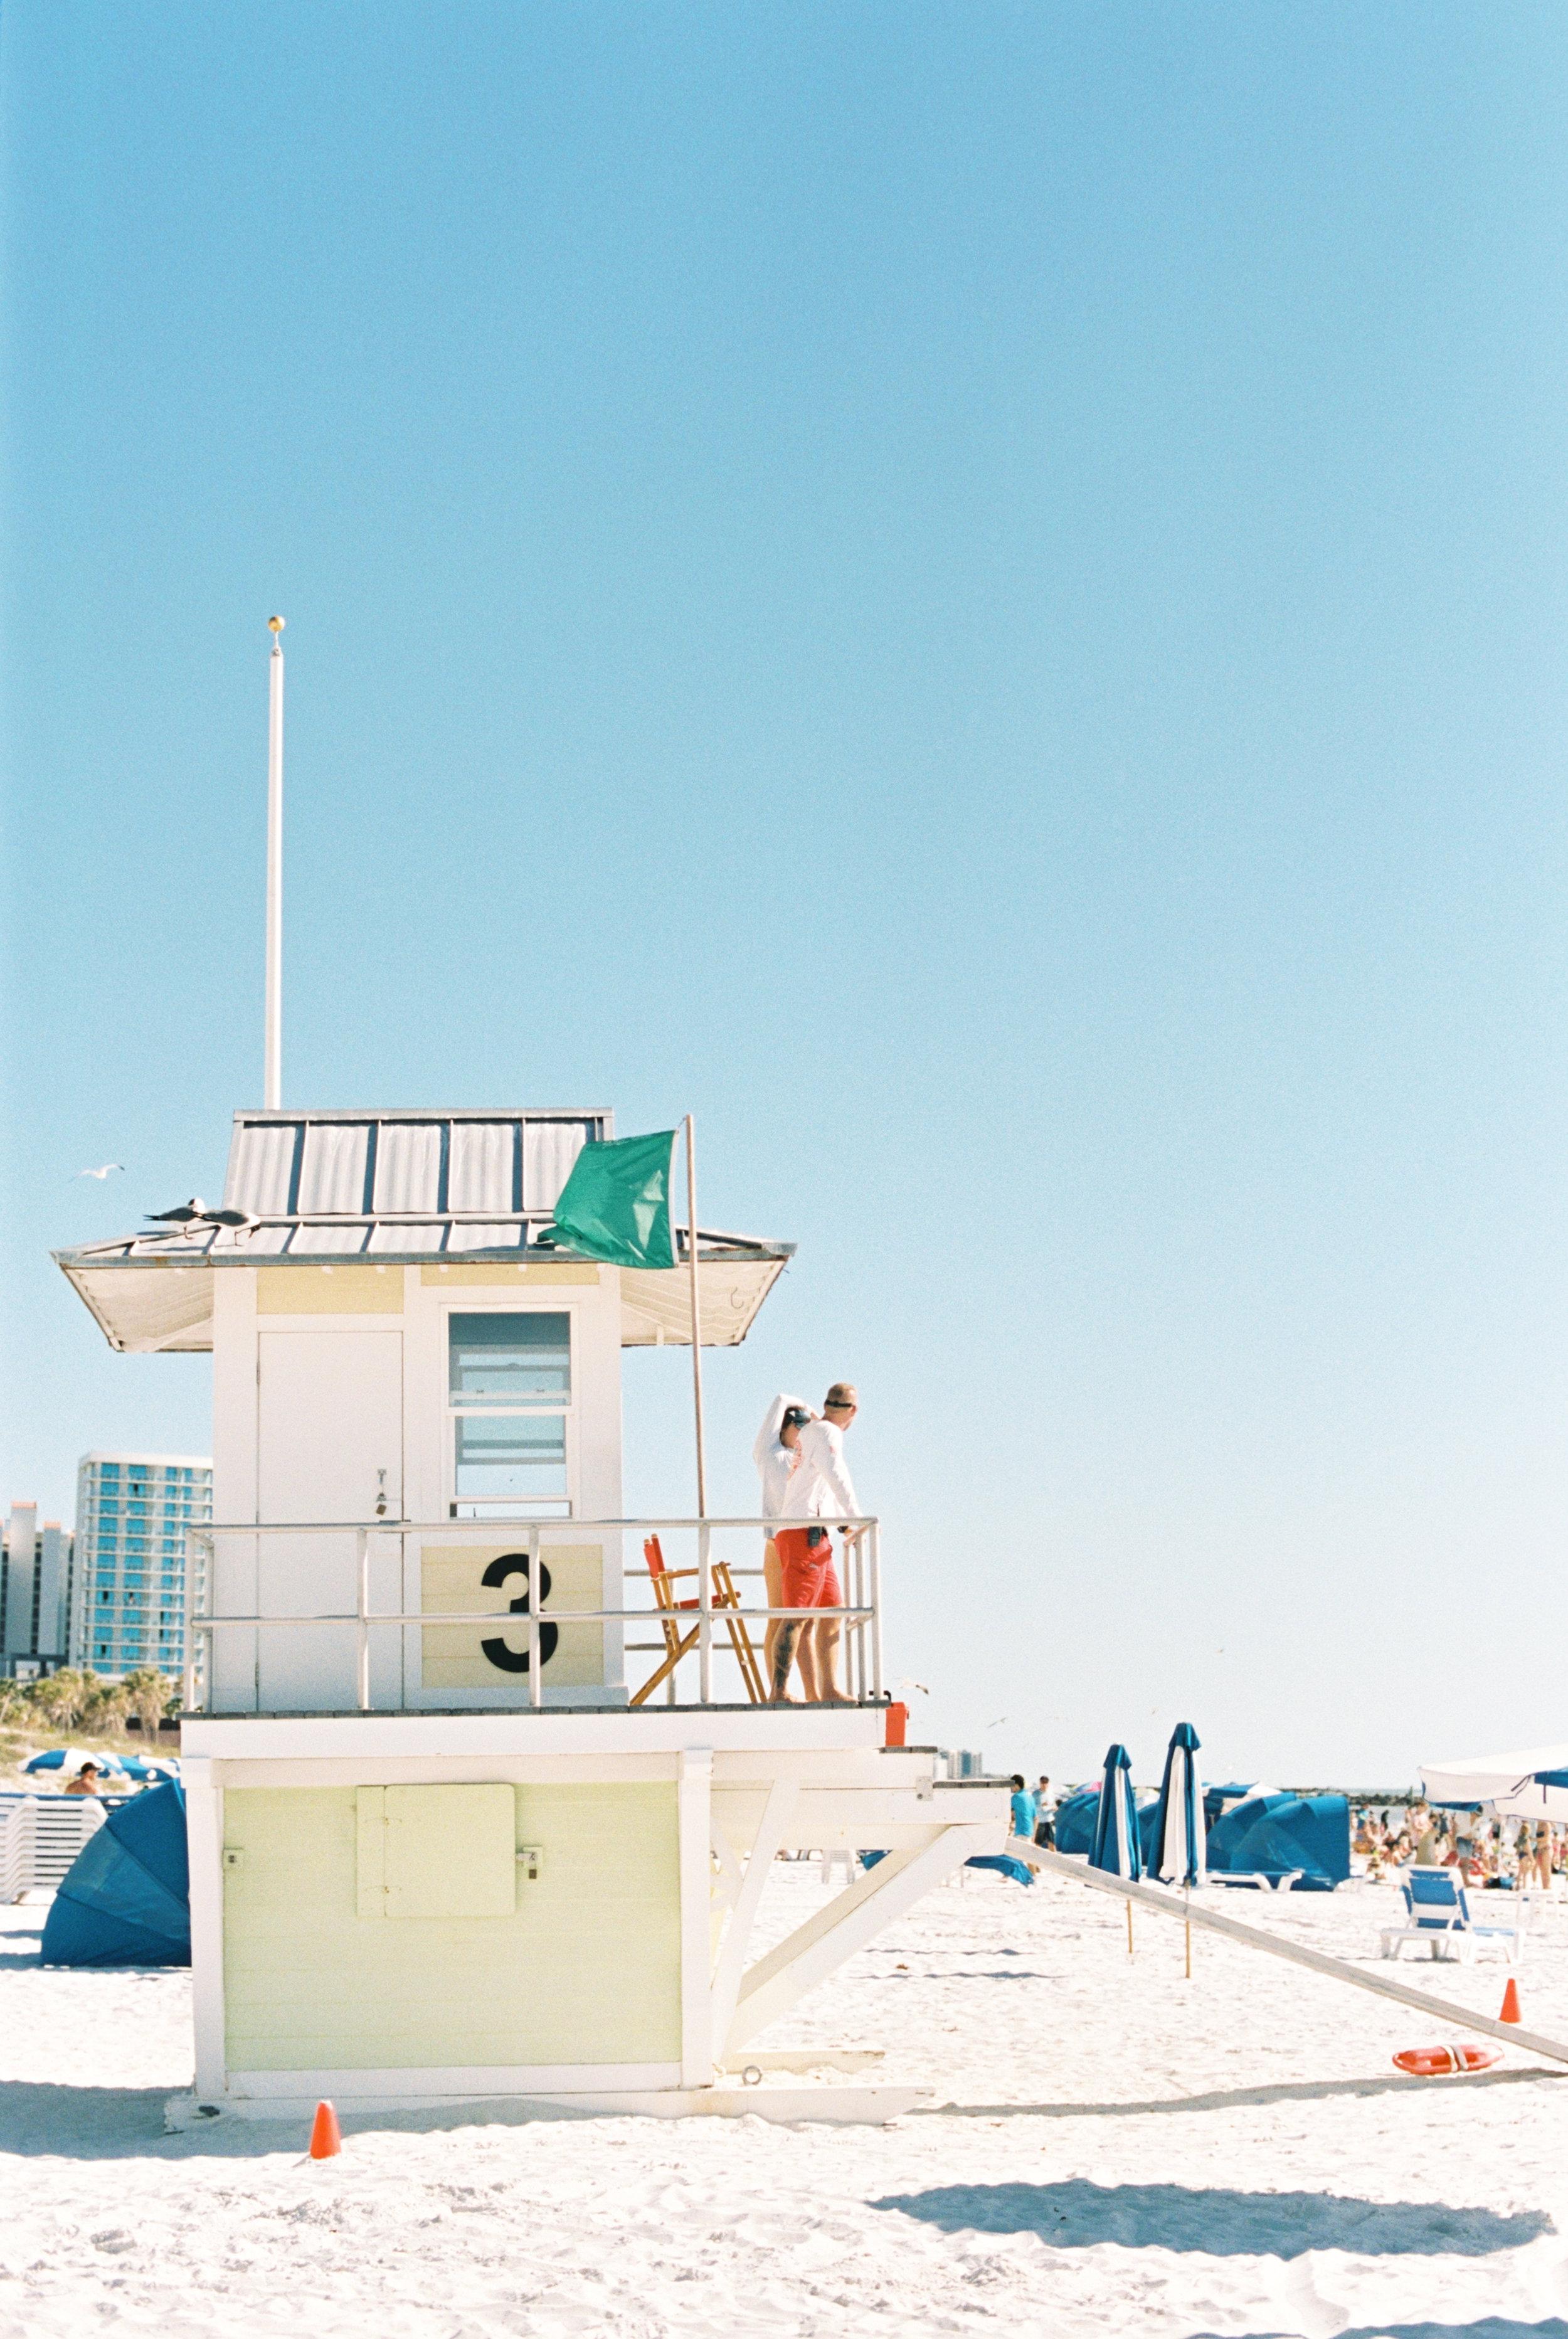 Clearwater_Beach_Lifeguard-8.jpg